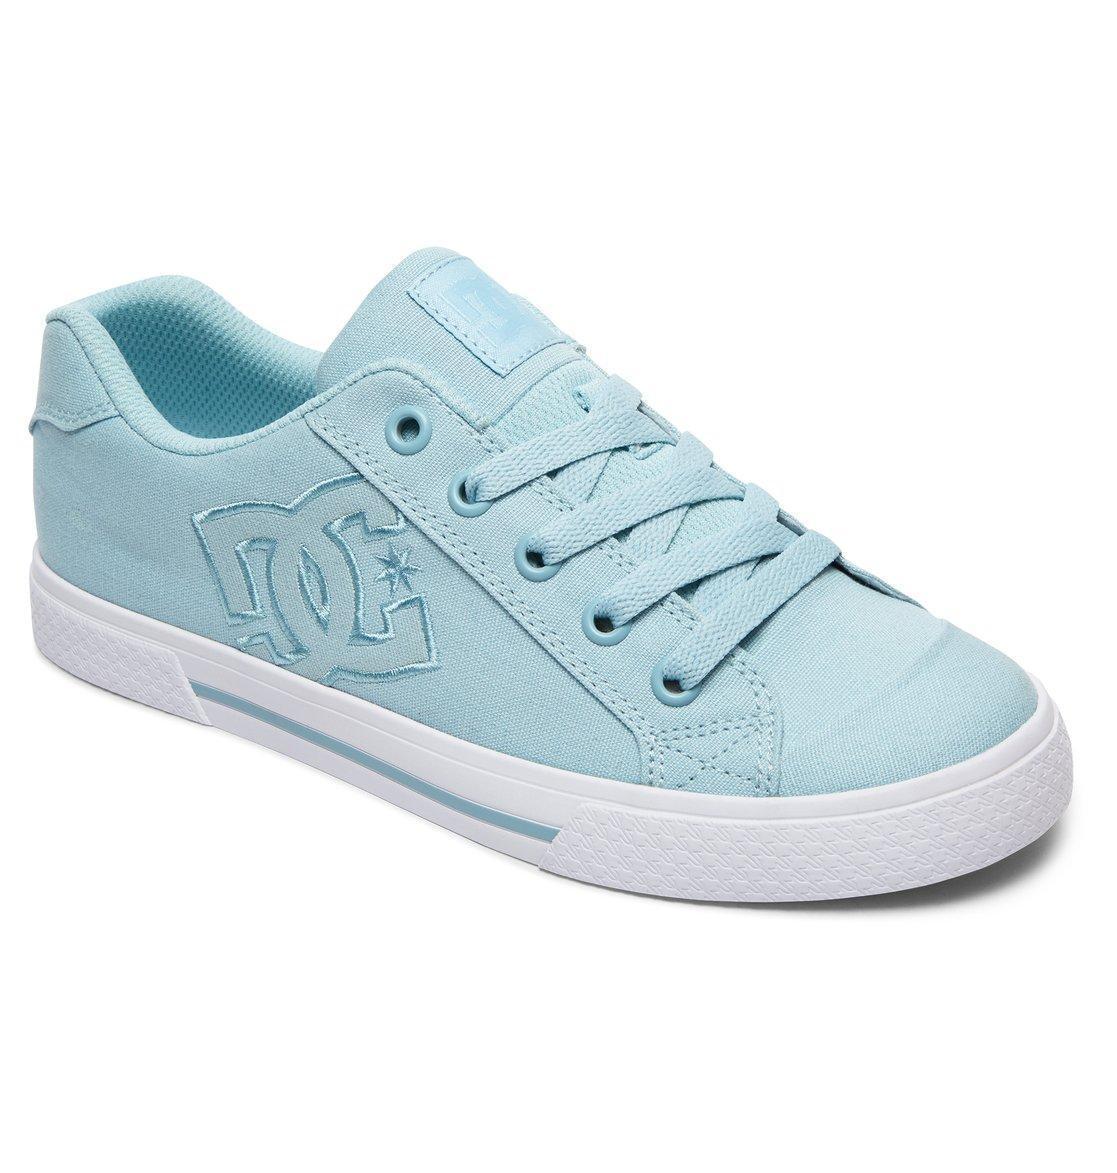 DC Shoes Scarpe da ginnastica da CHELSEA donna. NUOVO IN SCATOLA CHELSEA da TX Skate Blu Lacci Scarpe 8S 26 LTB 3c1a47